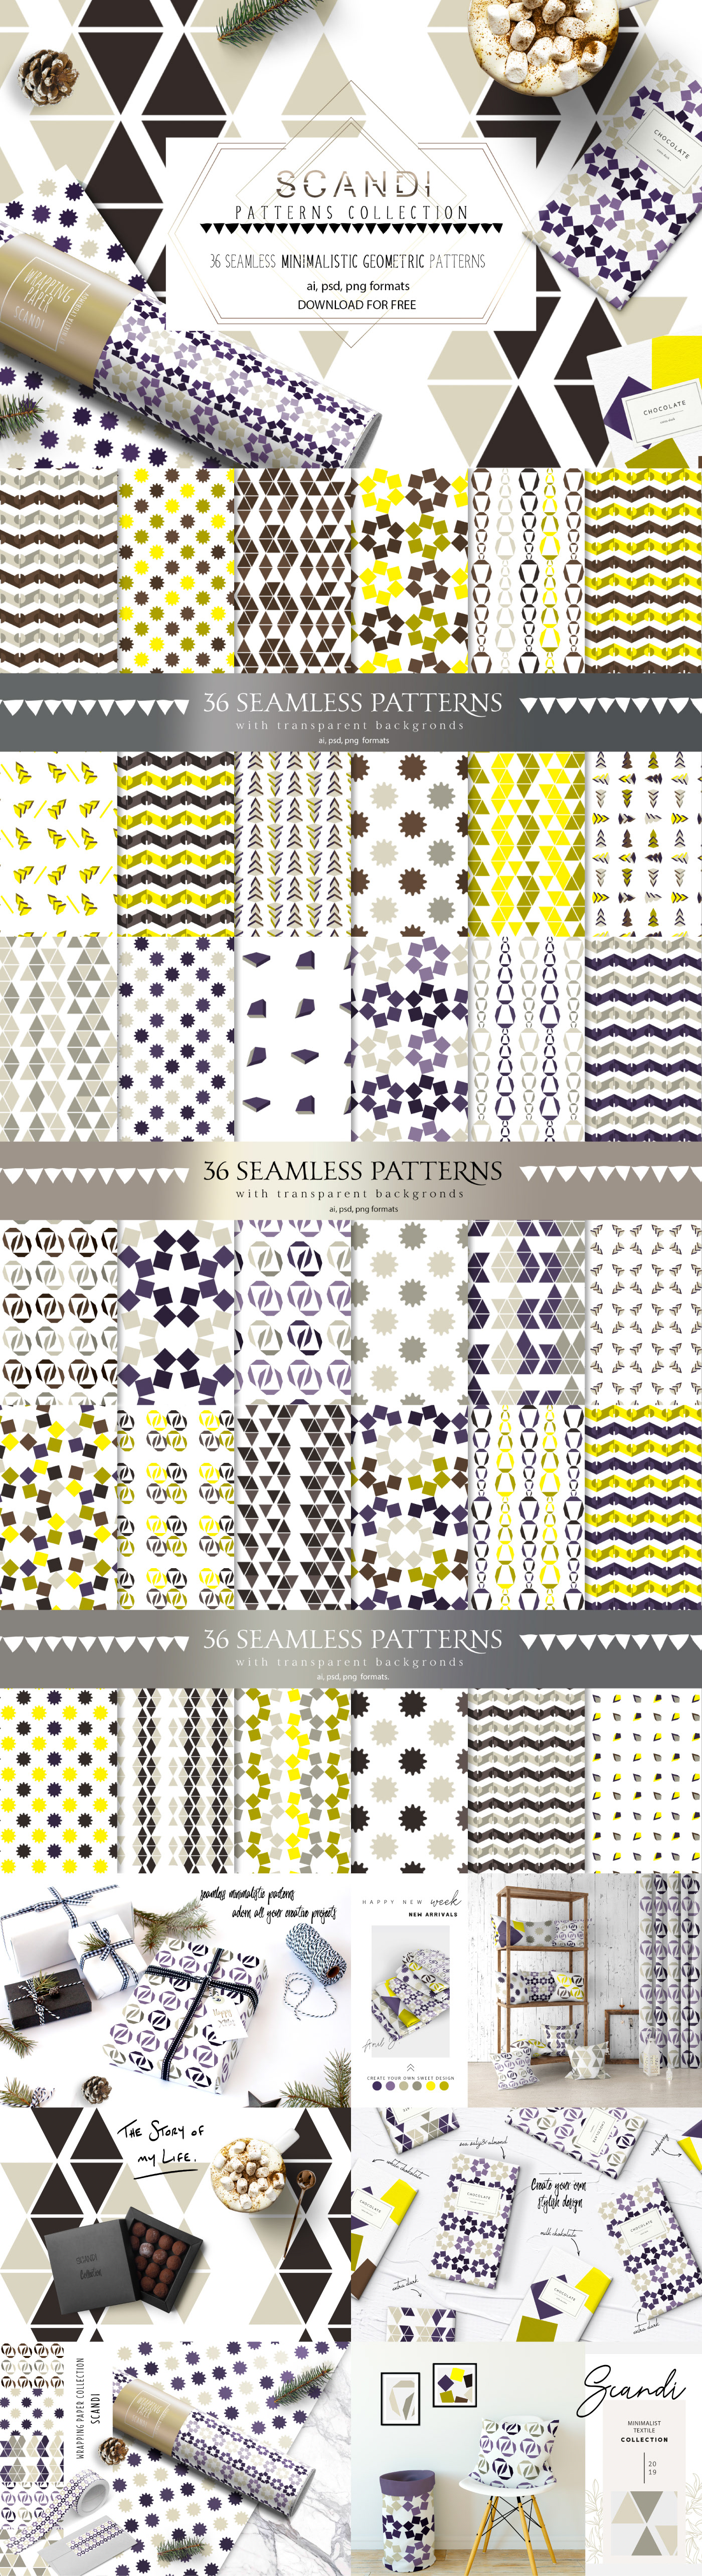 Free Download: Scandi Patterns Collection | Webdesigner Depot